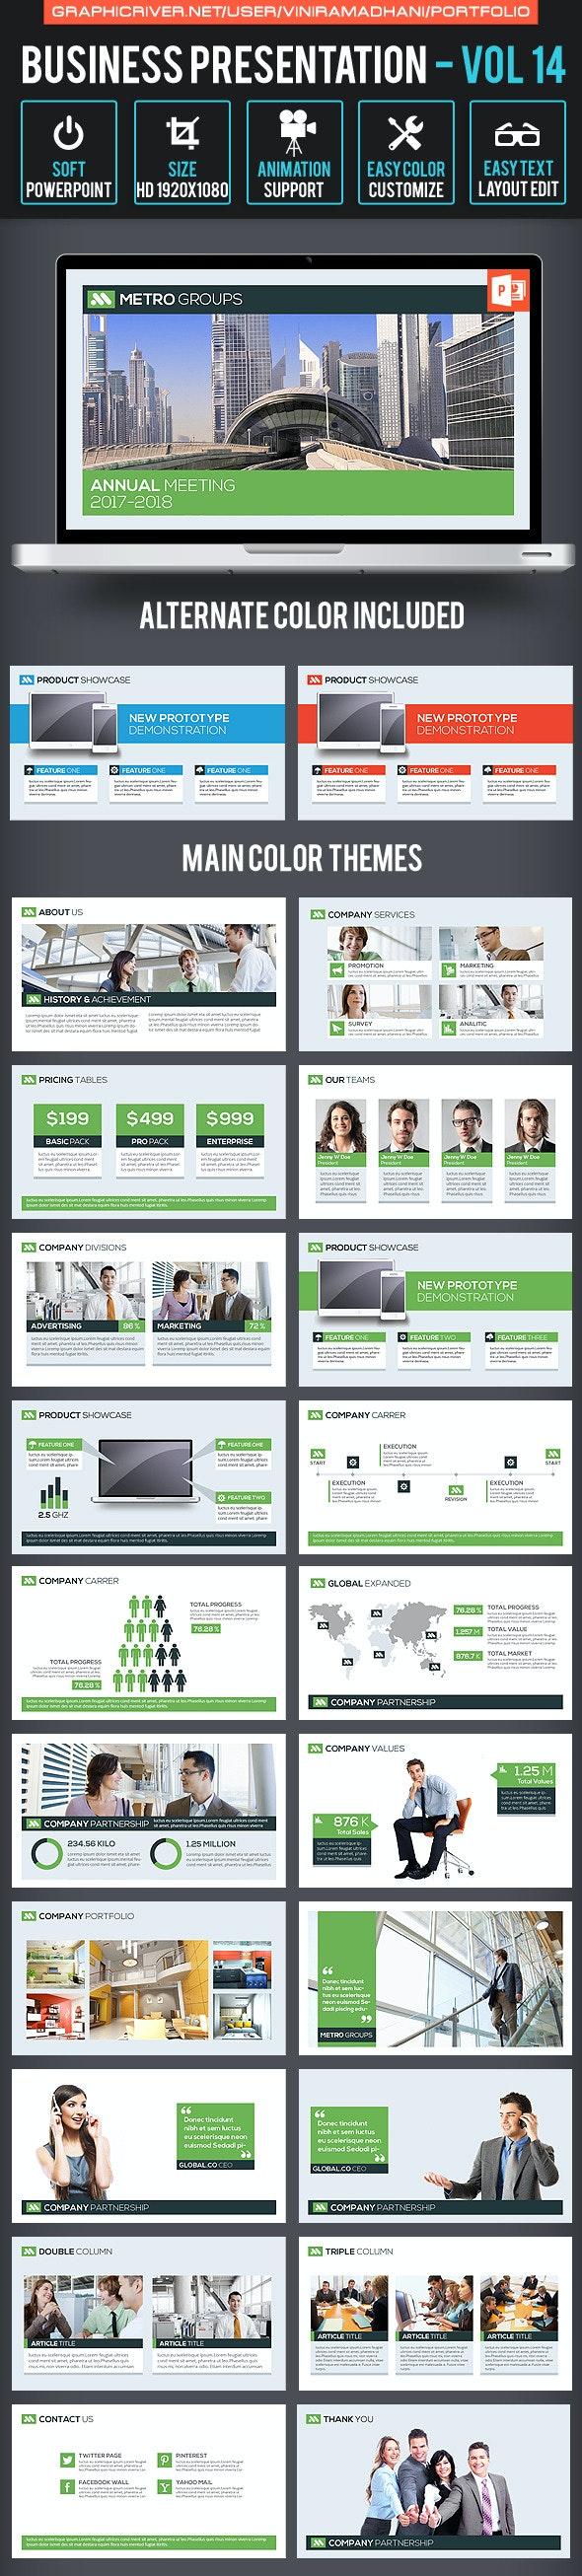 Business Presentation Volume 14 - Business PowerPoint Templates